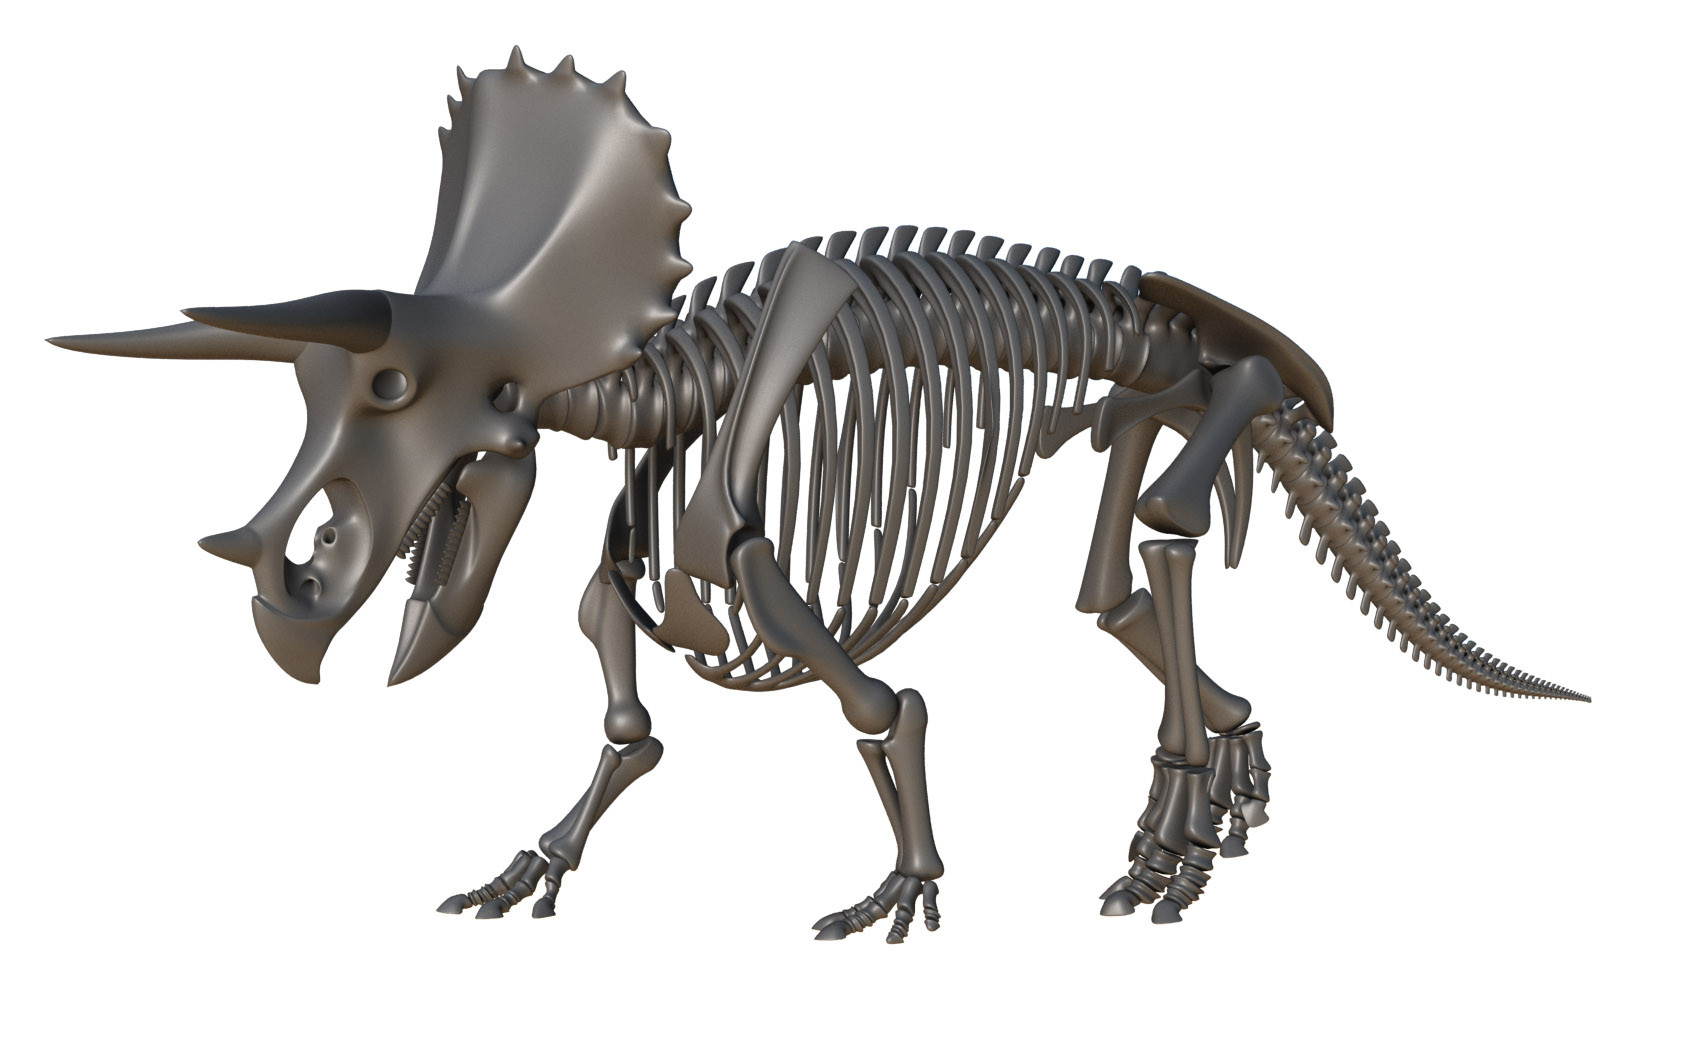 triceritopSkeletonRender.jpg